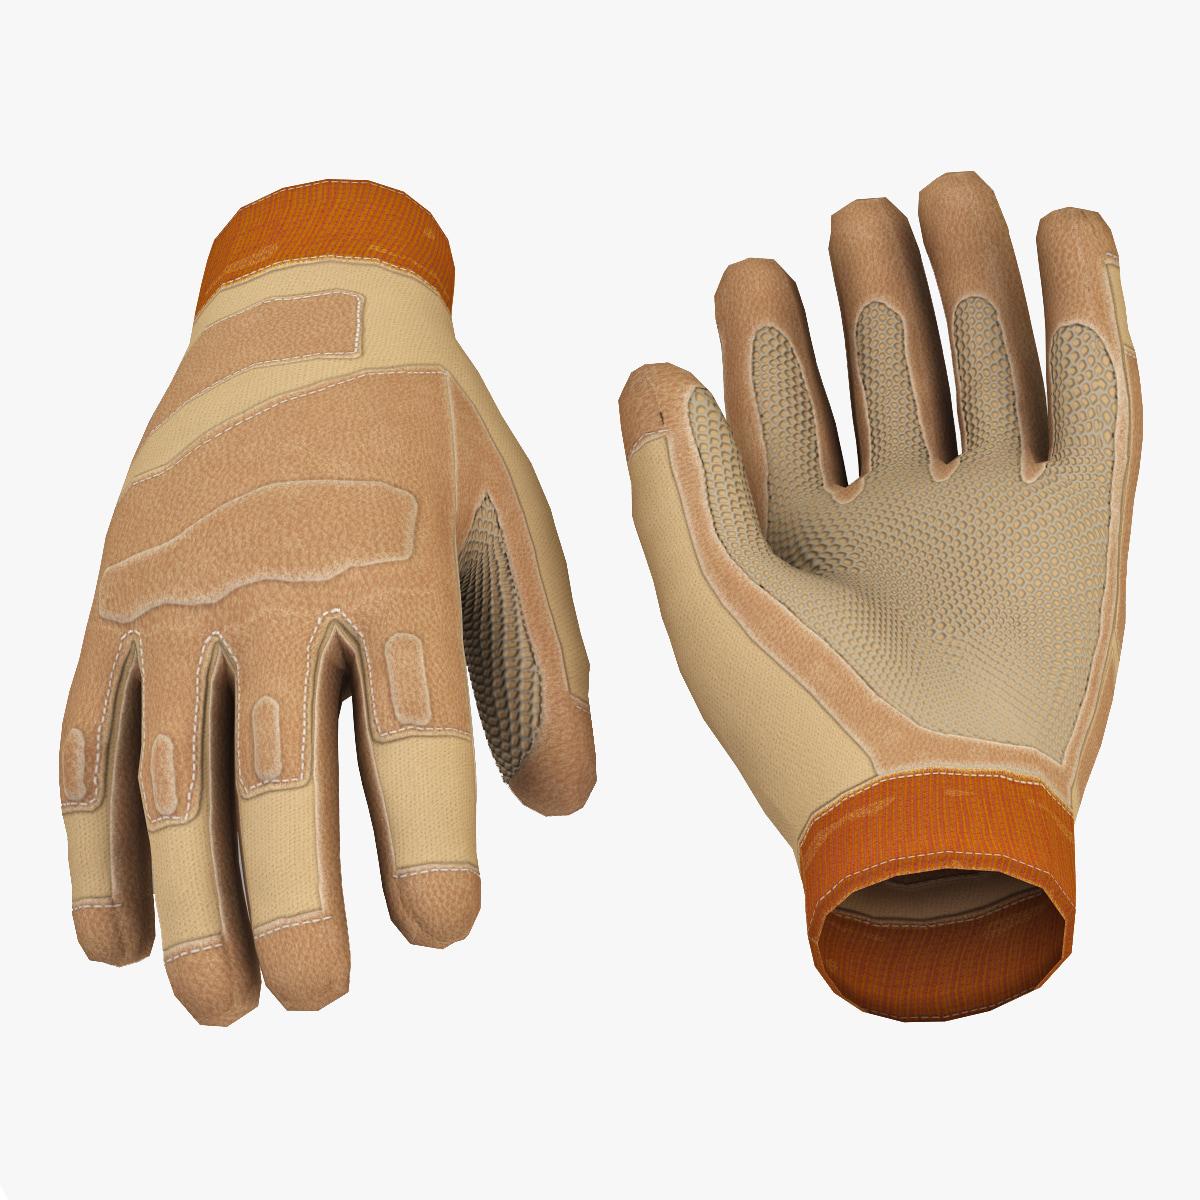 Soldier_Gloves_V2_000.jpg